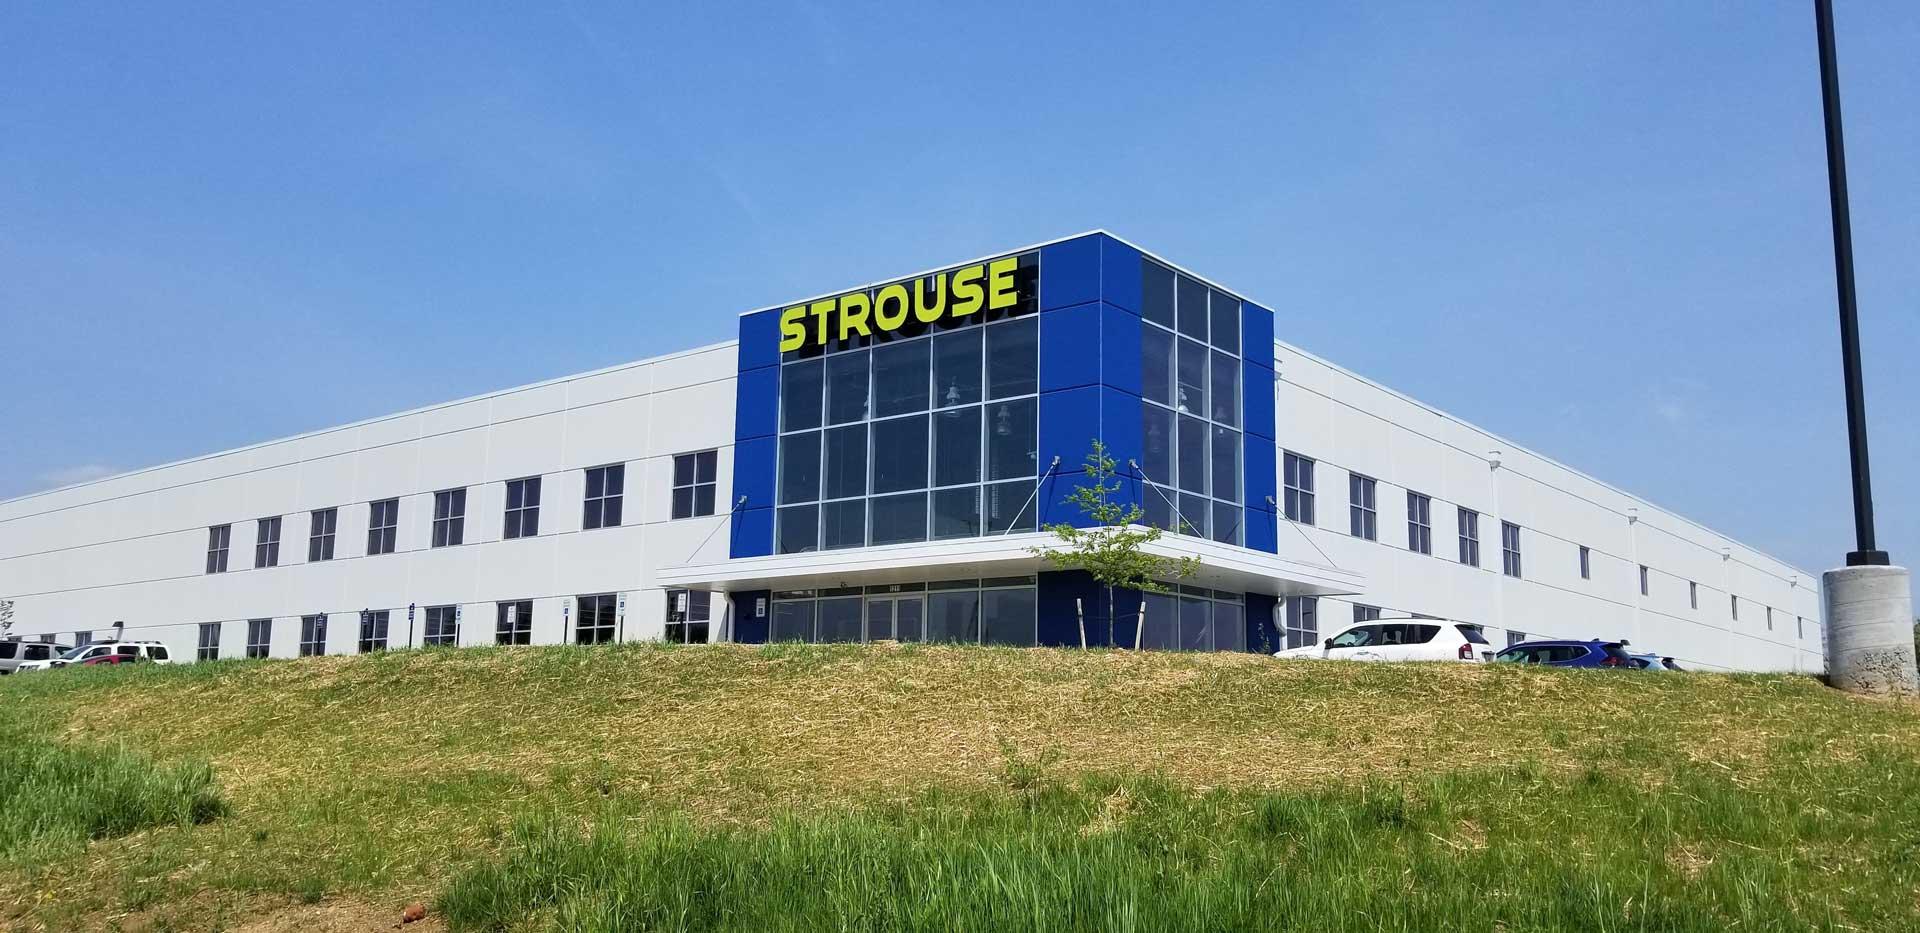 strouse_building